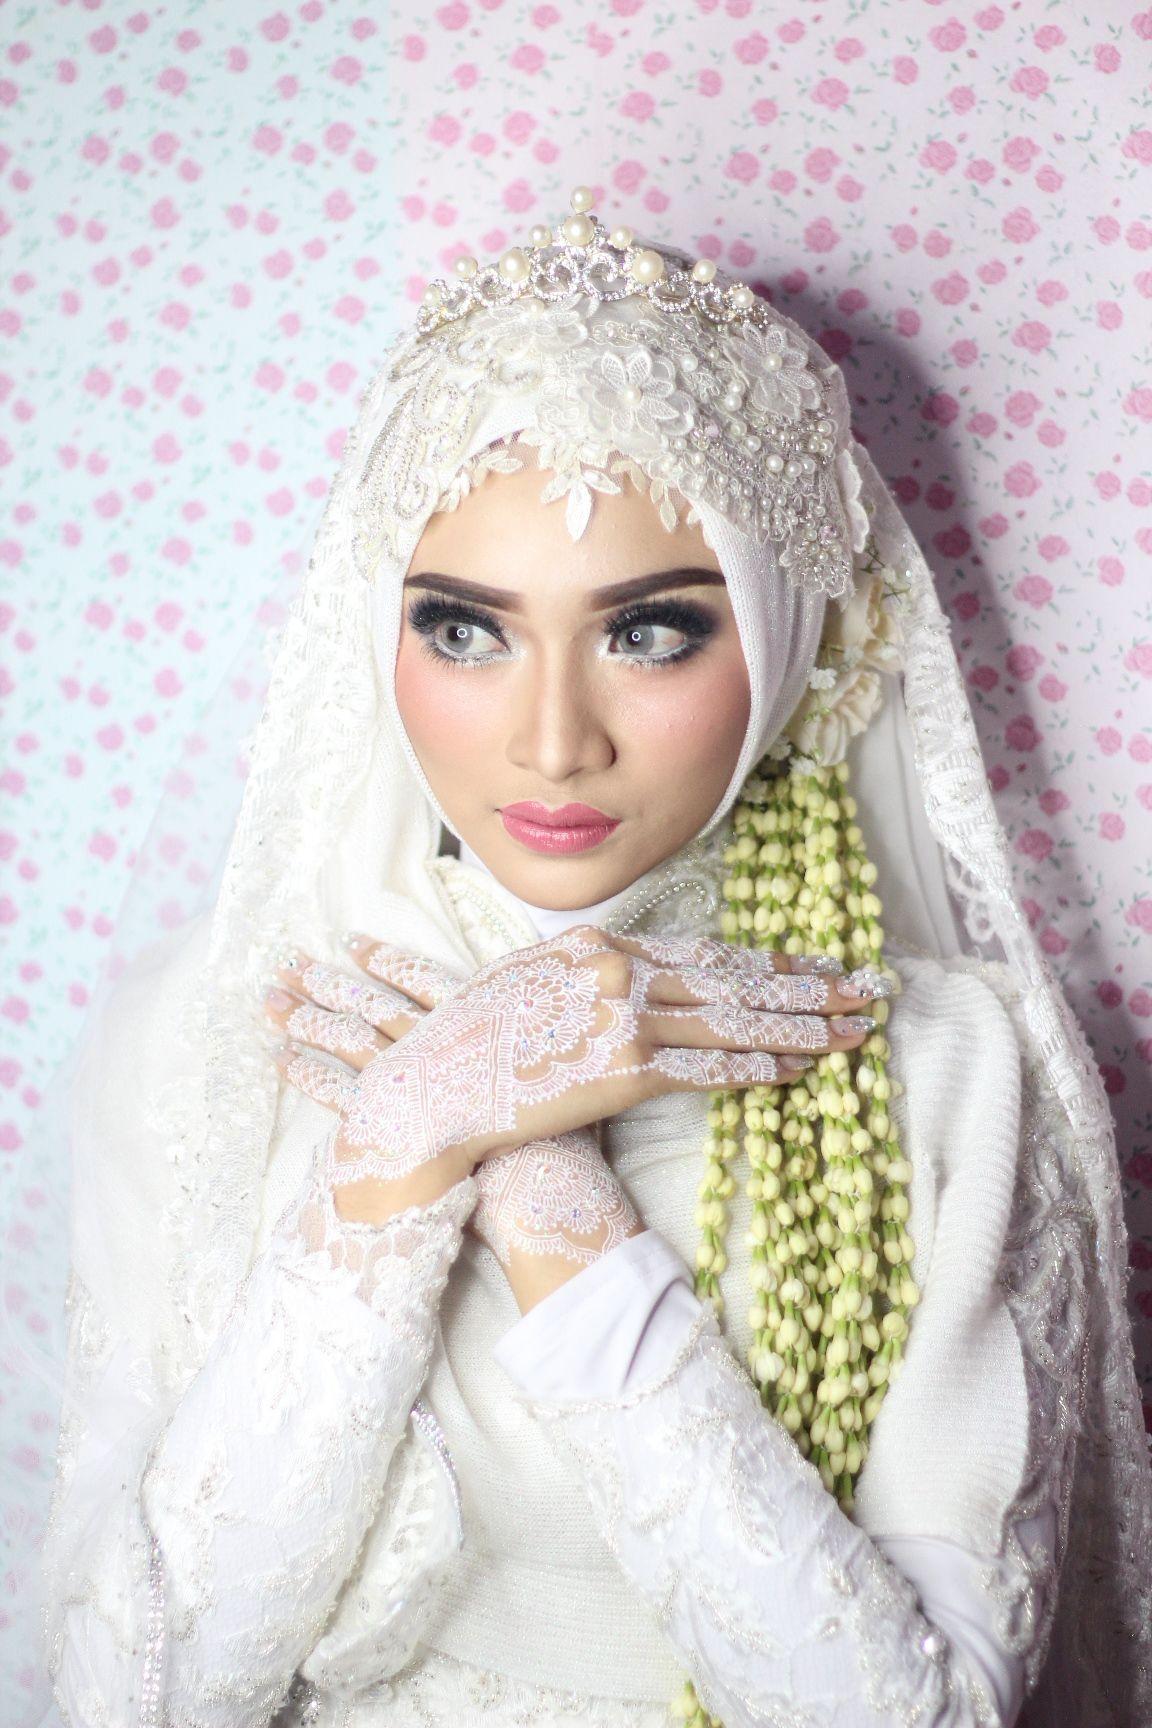 Pin Oleh Mimi Di Mariages Kerudung Pengantin Pengantin Wanita